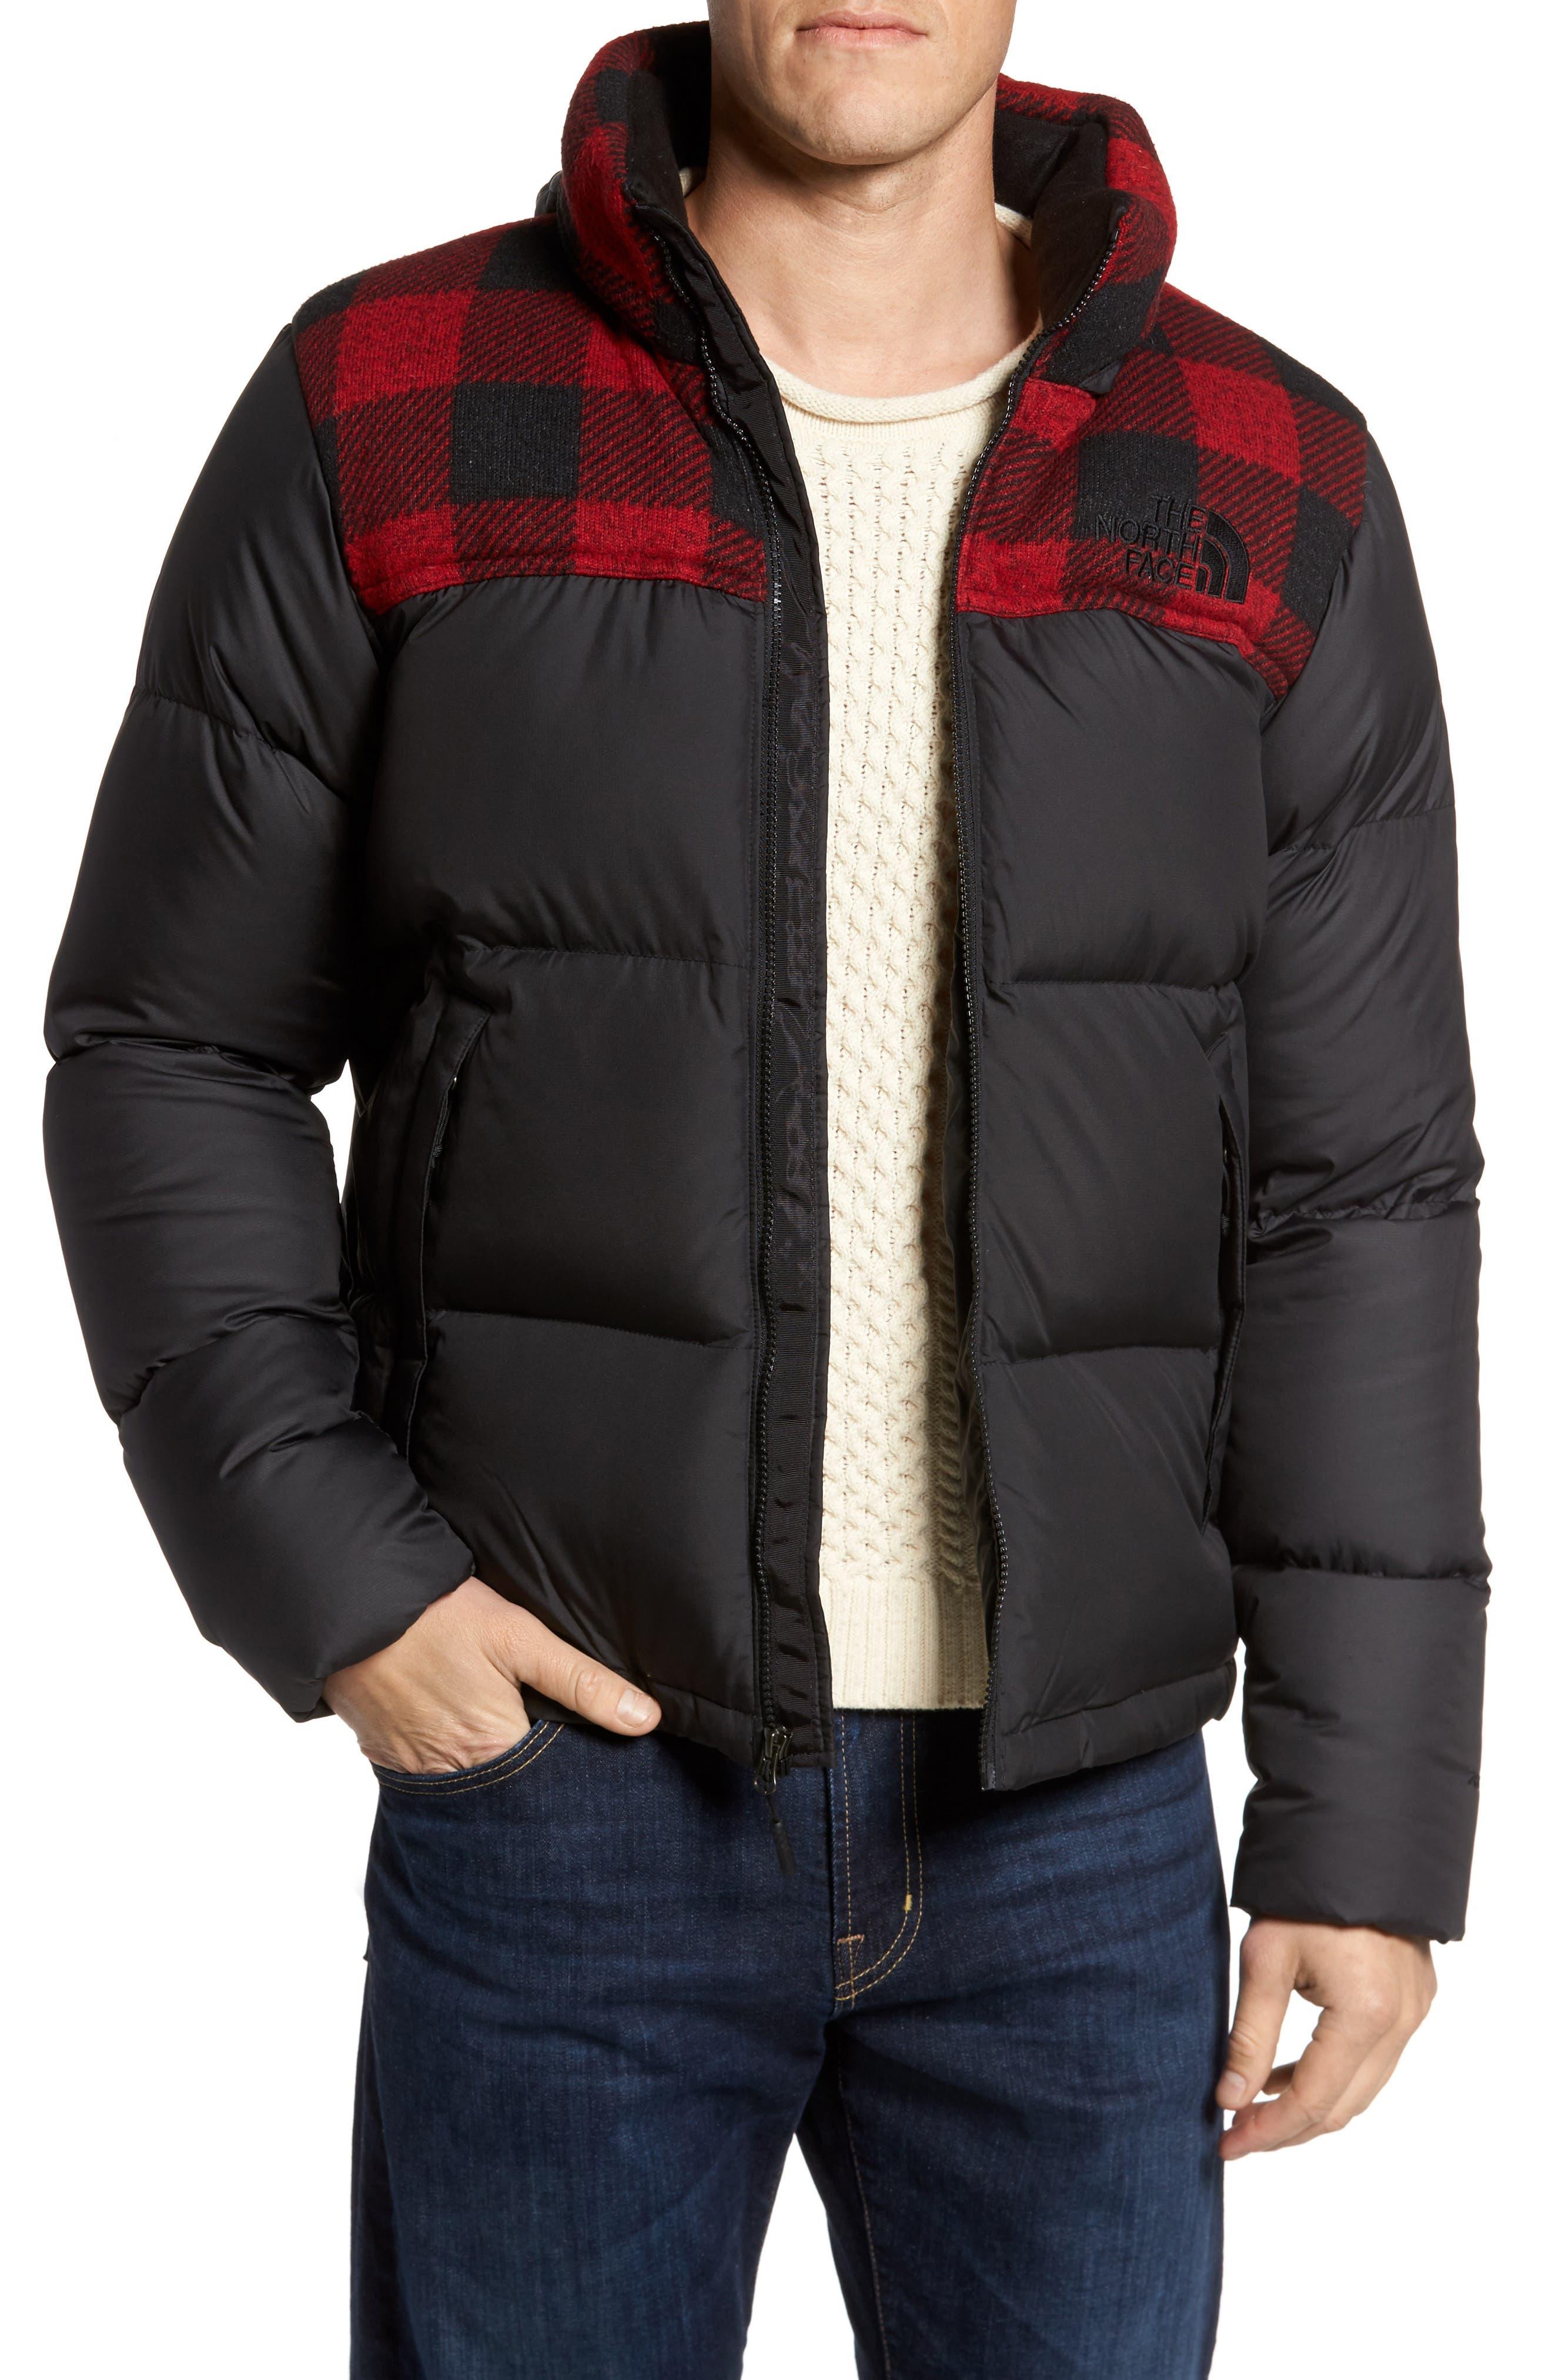 Mixed Media Jacket,                             Main thumbnail 1, color,                             Black/ Cardinal Red Grizzly